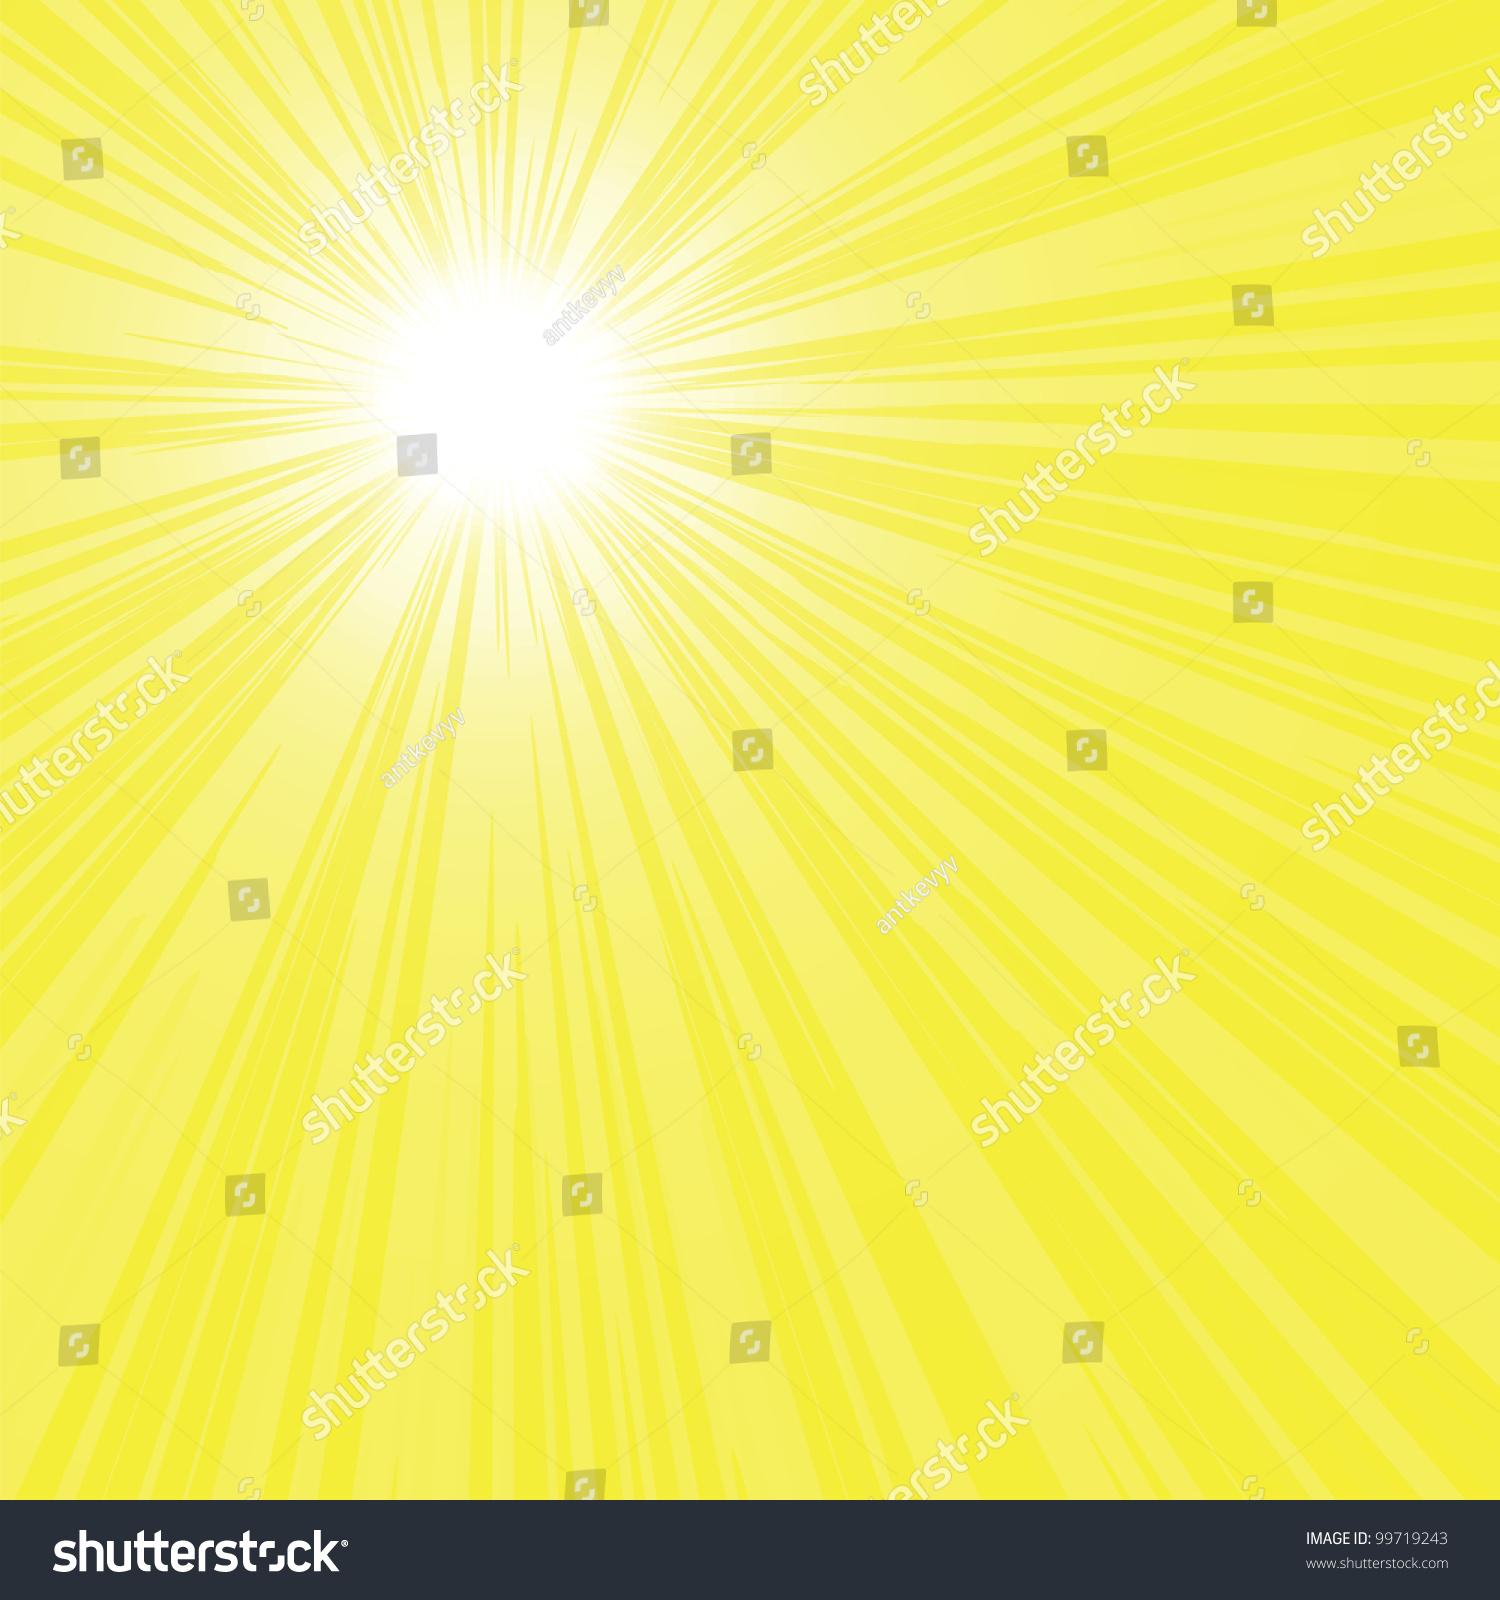 yellow rays vector - photo #38